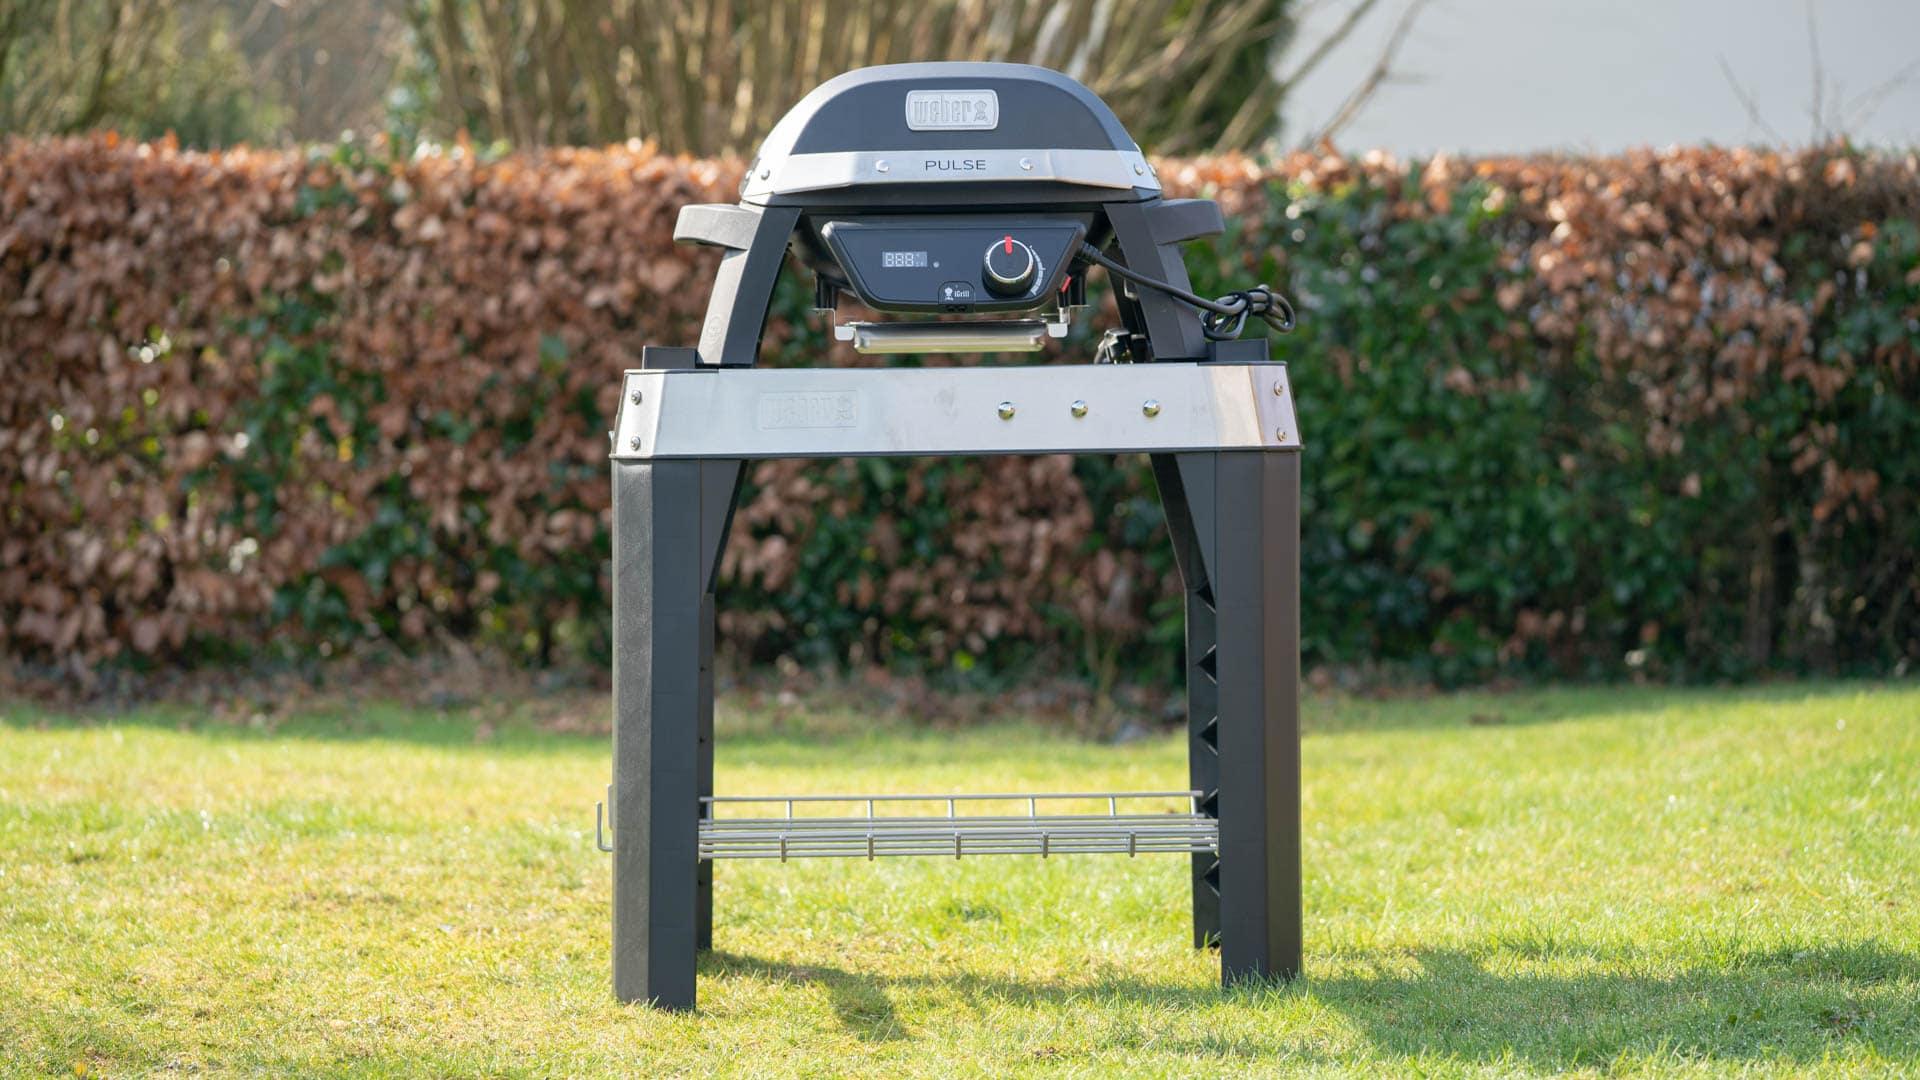 Weber Elektrogrill Pulse : Der weber pulse im test der beste elektro grill auf dem